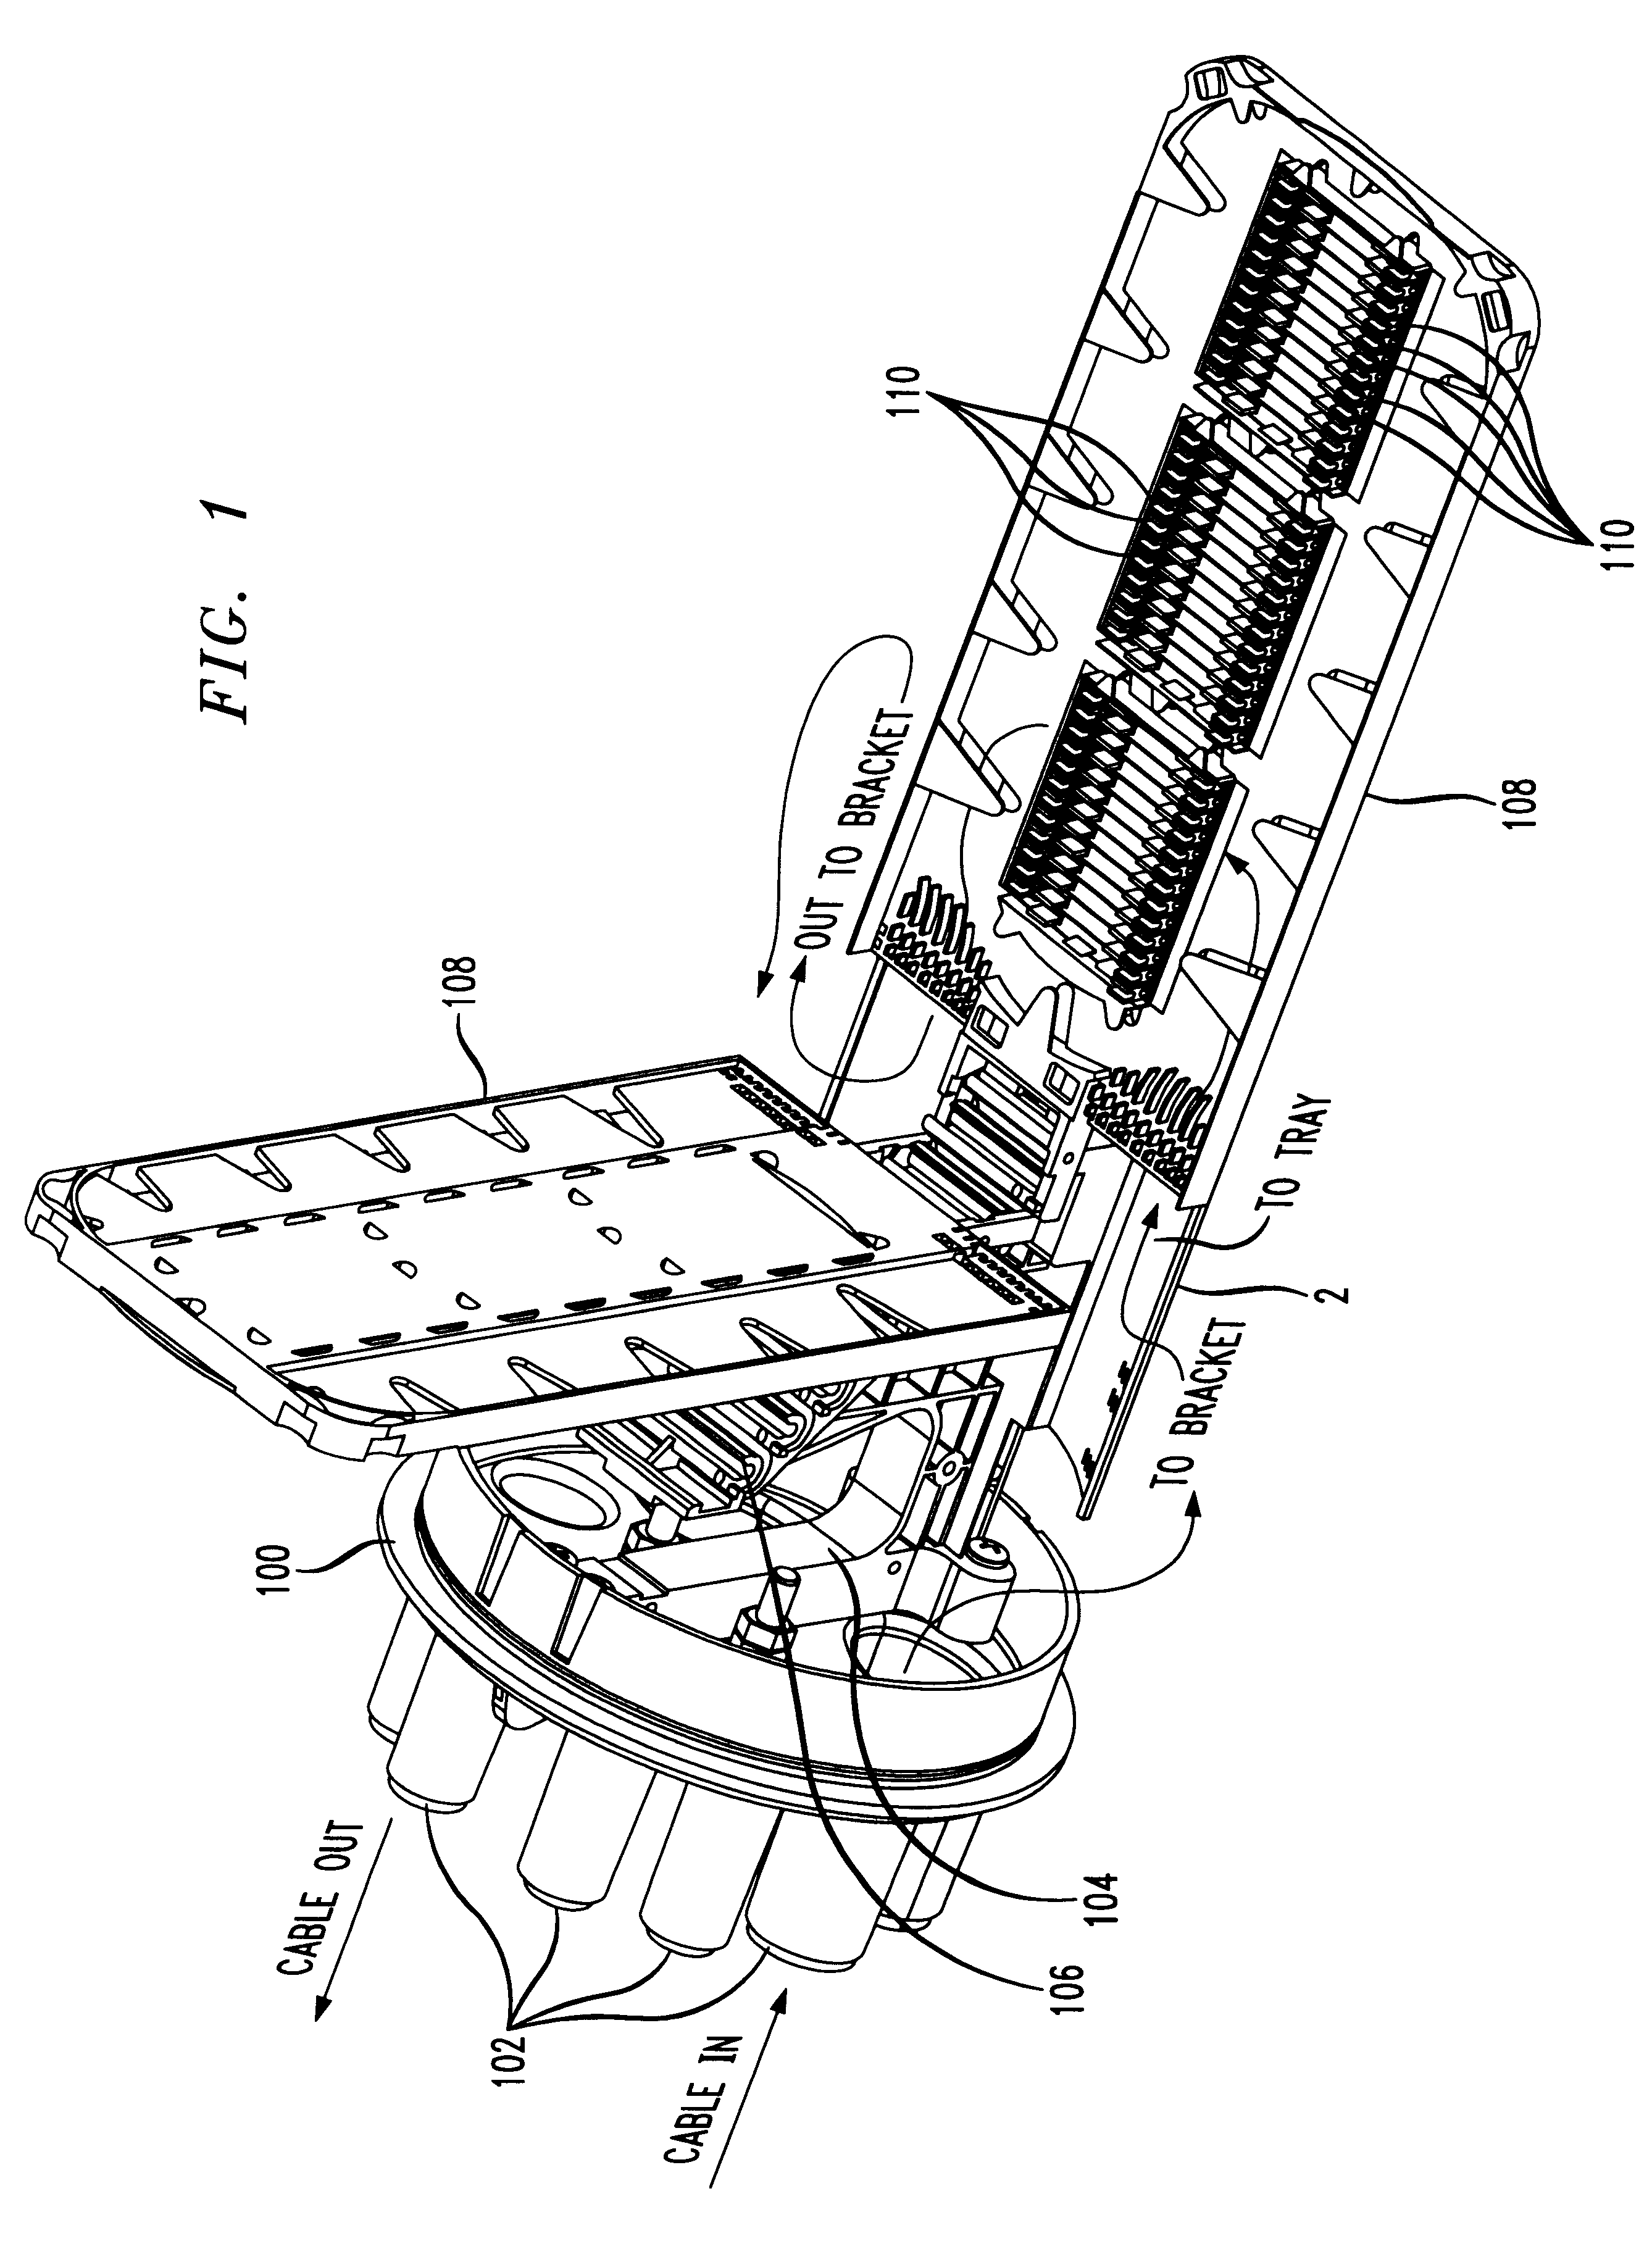 patent us6188826 - optic fiber slack storage bracket